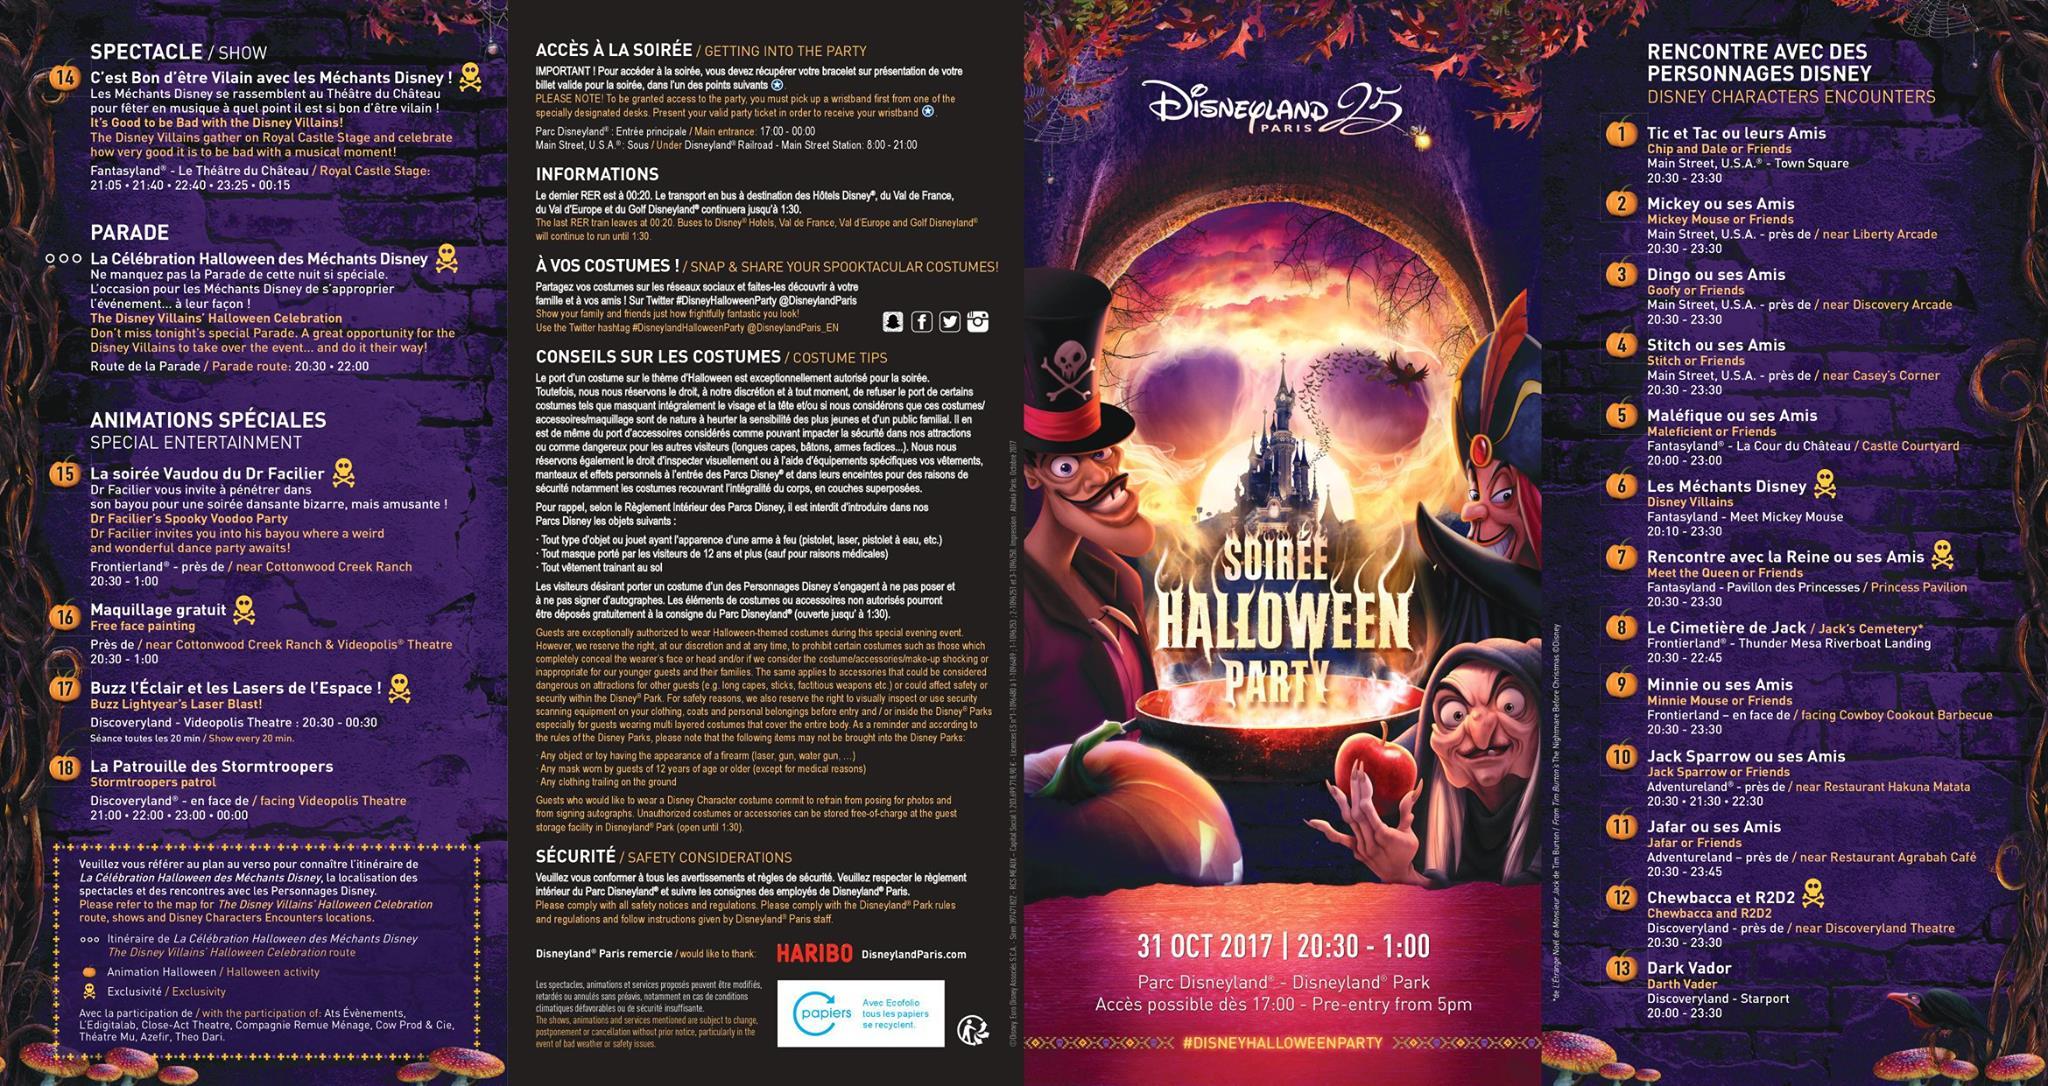 Disneyland Paris Halloween Soirée Programme 2017